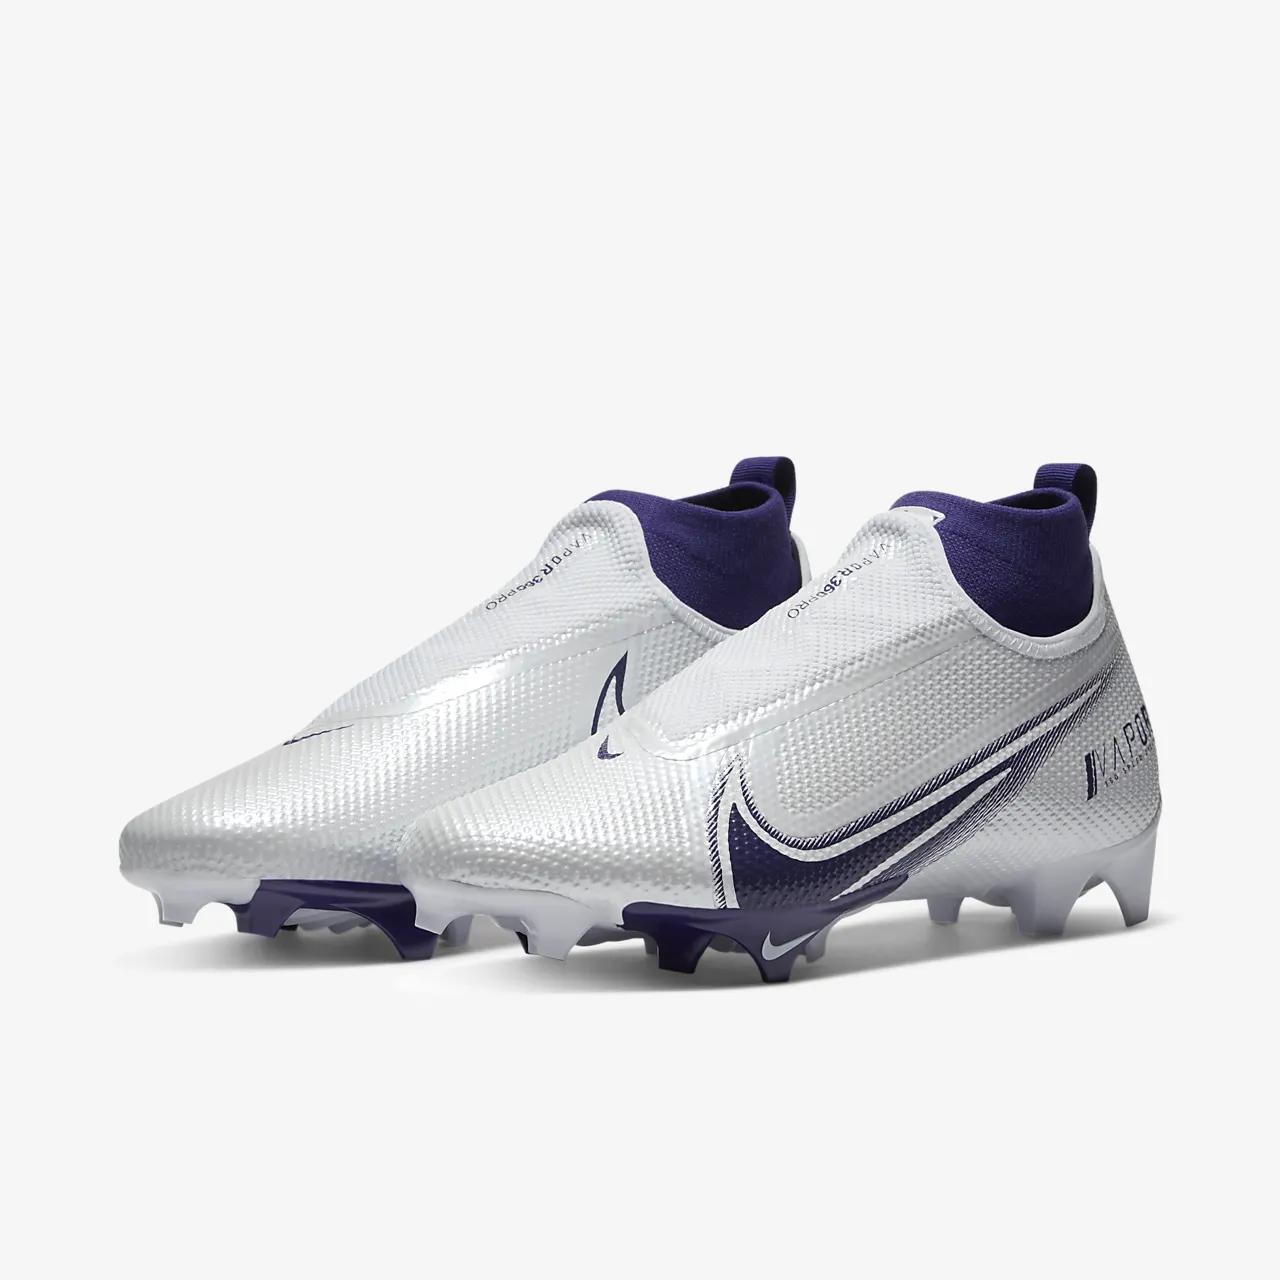 Nike Vapor Edge Pro 360 Men's Football Cleat AO8277-107